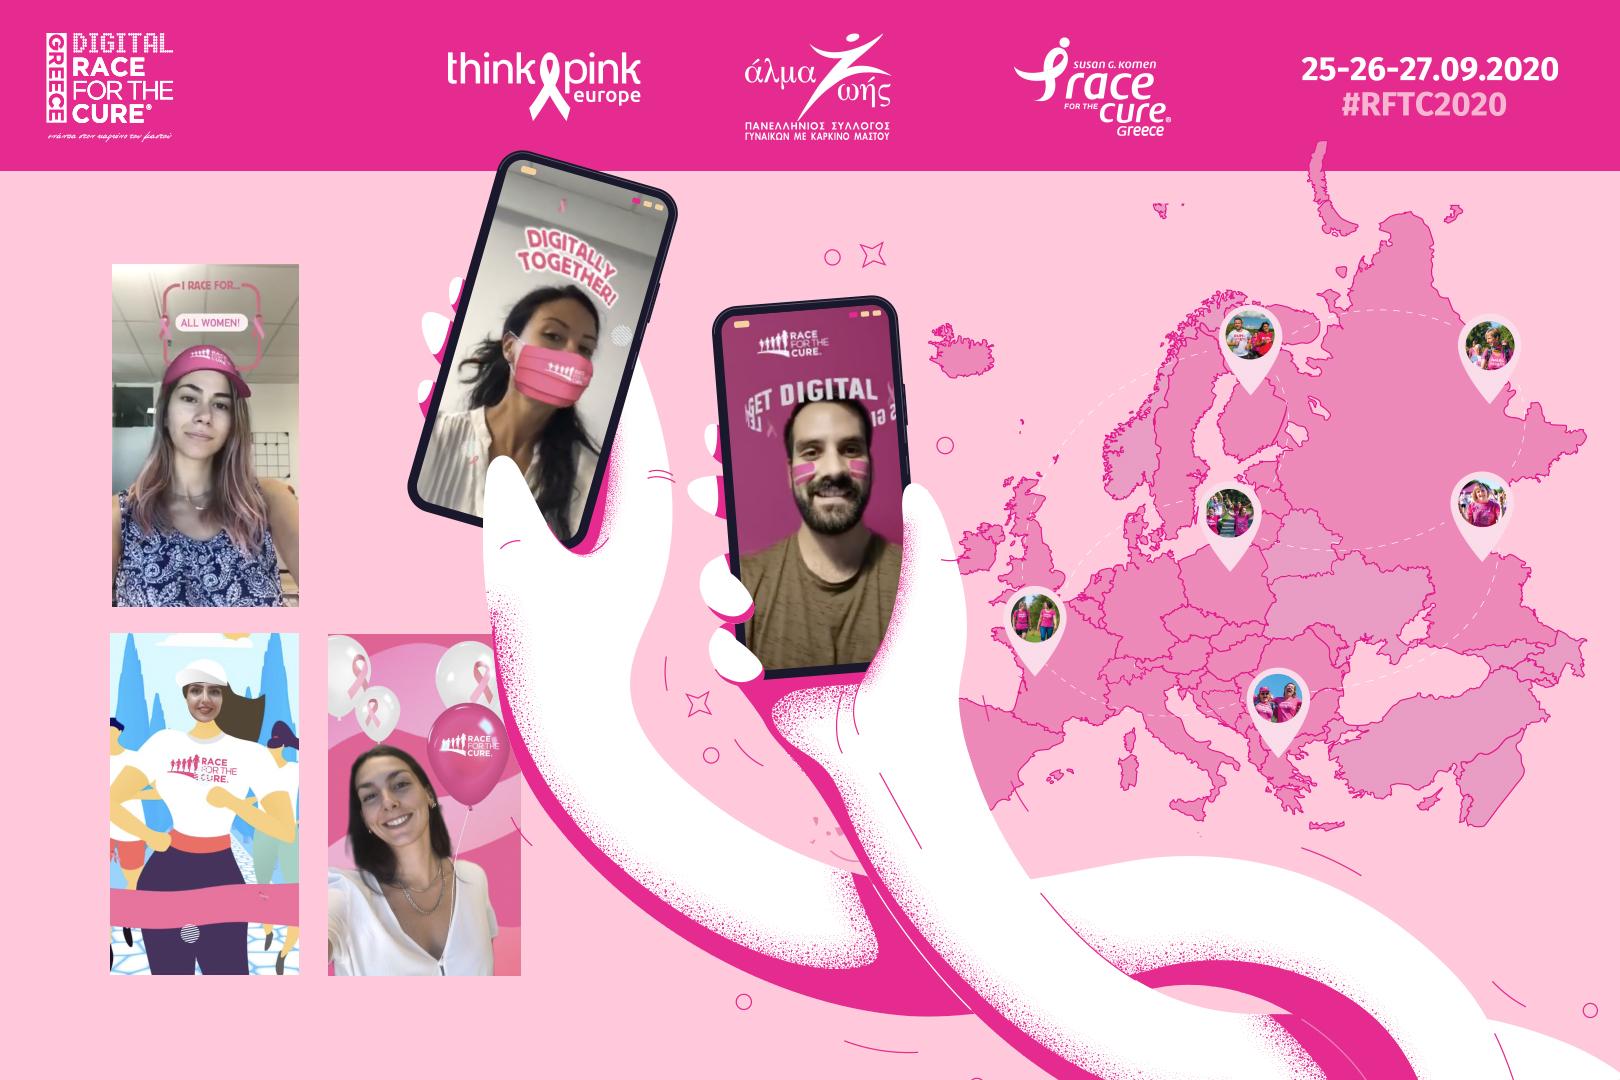 Greece Race for the Cure 2020: Φέτος, τρέχουμε αλλιώς!